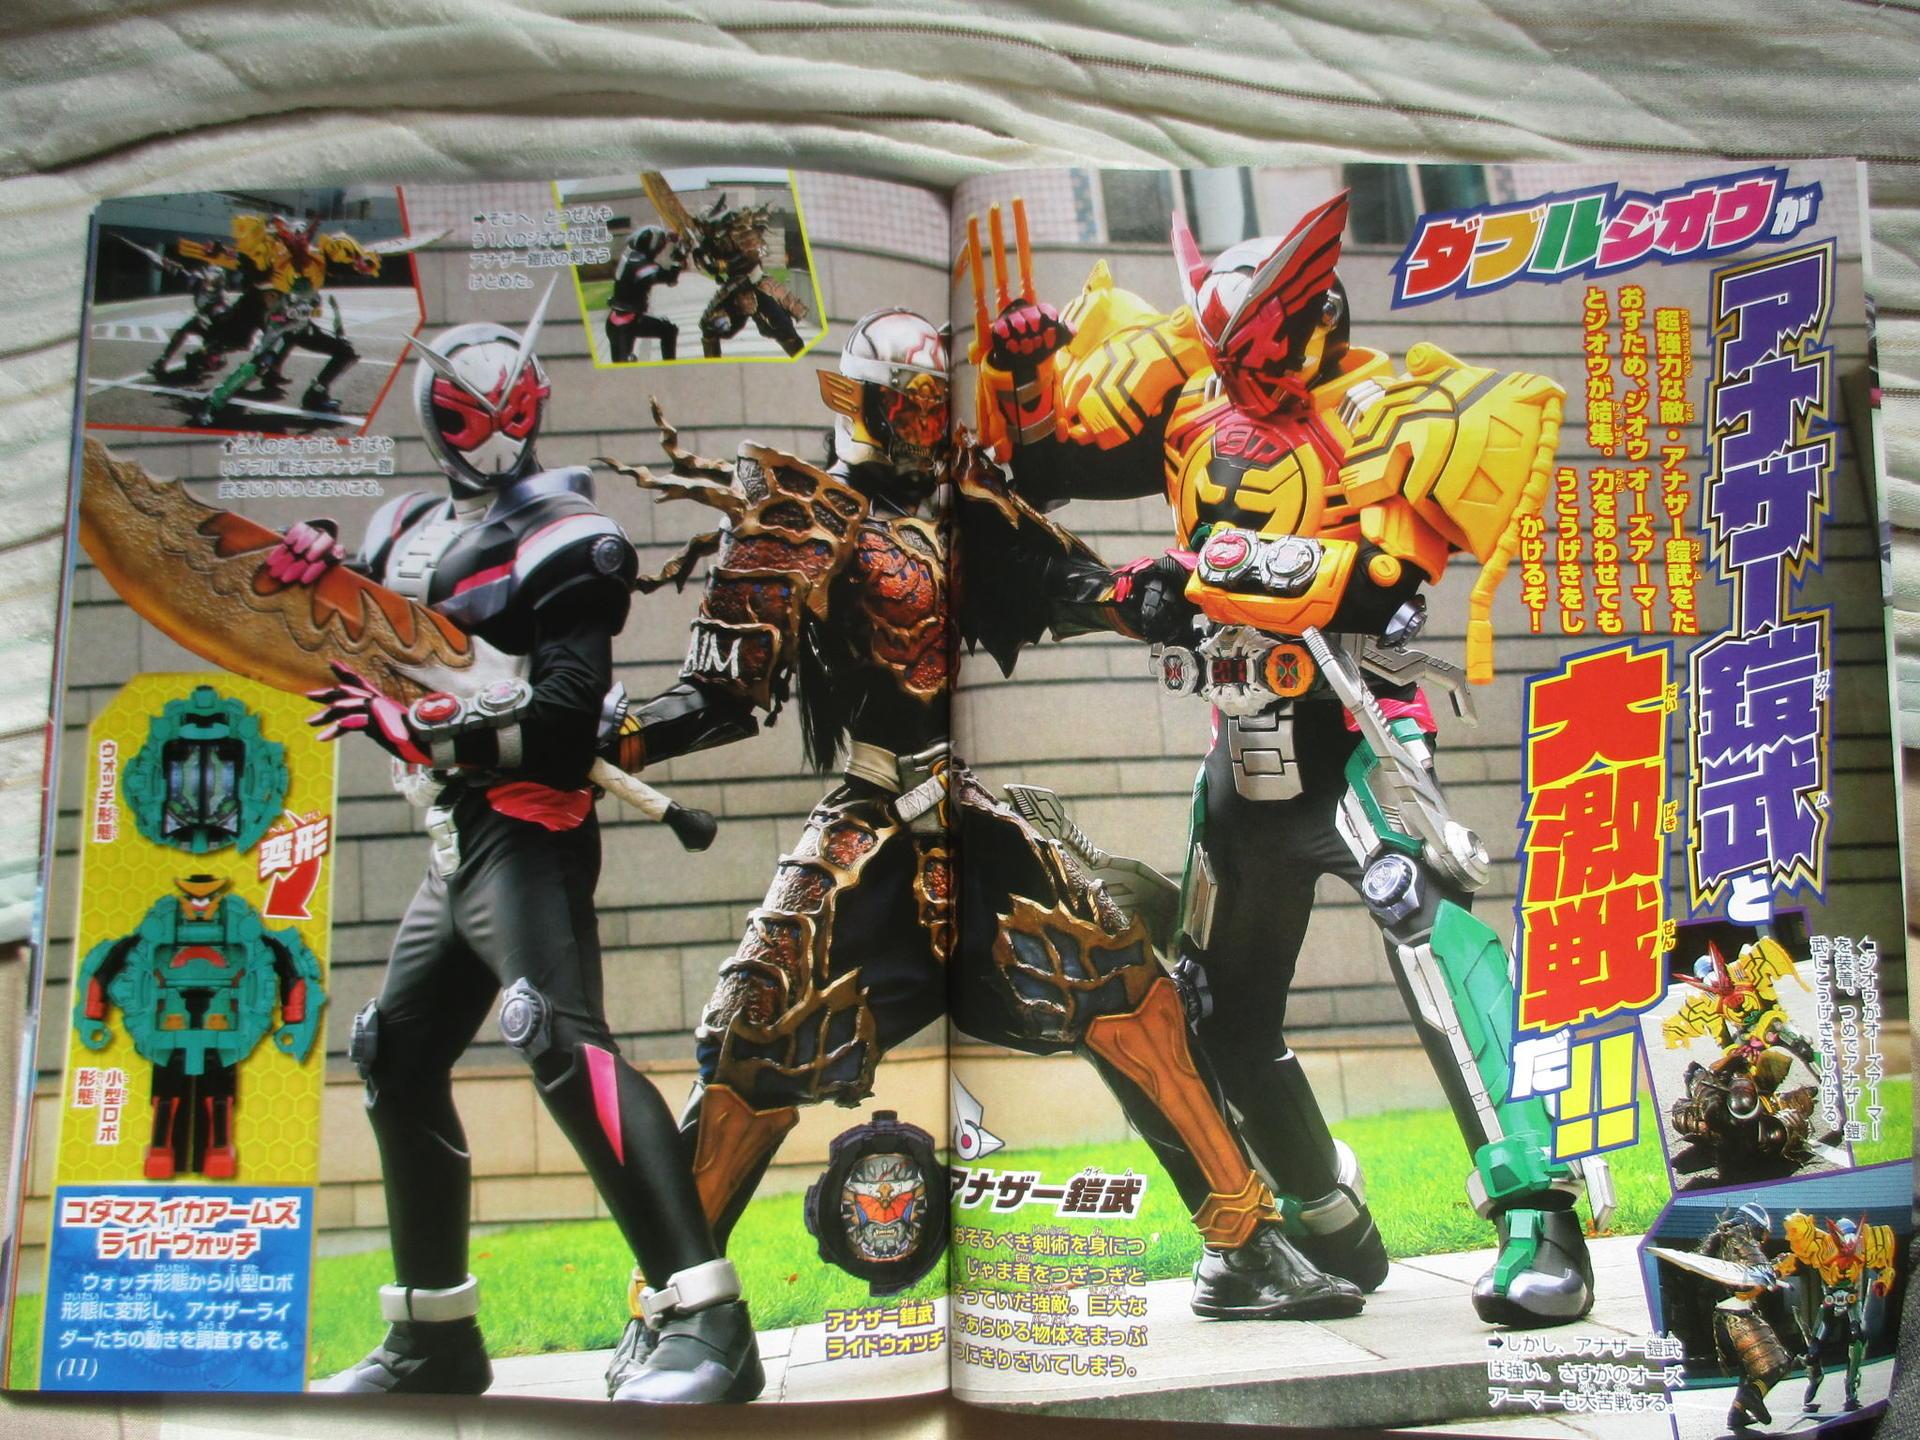 New Kamen Rider Zi O Magazine Scans Released Kamen Rider Gaim